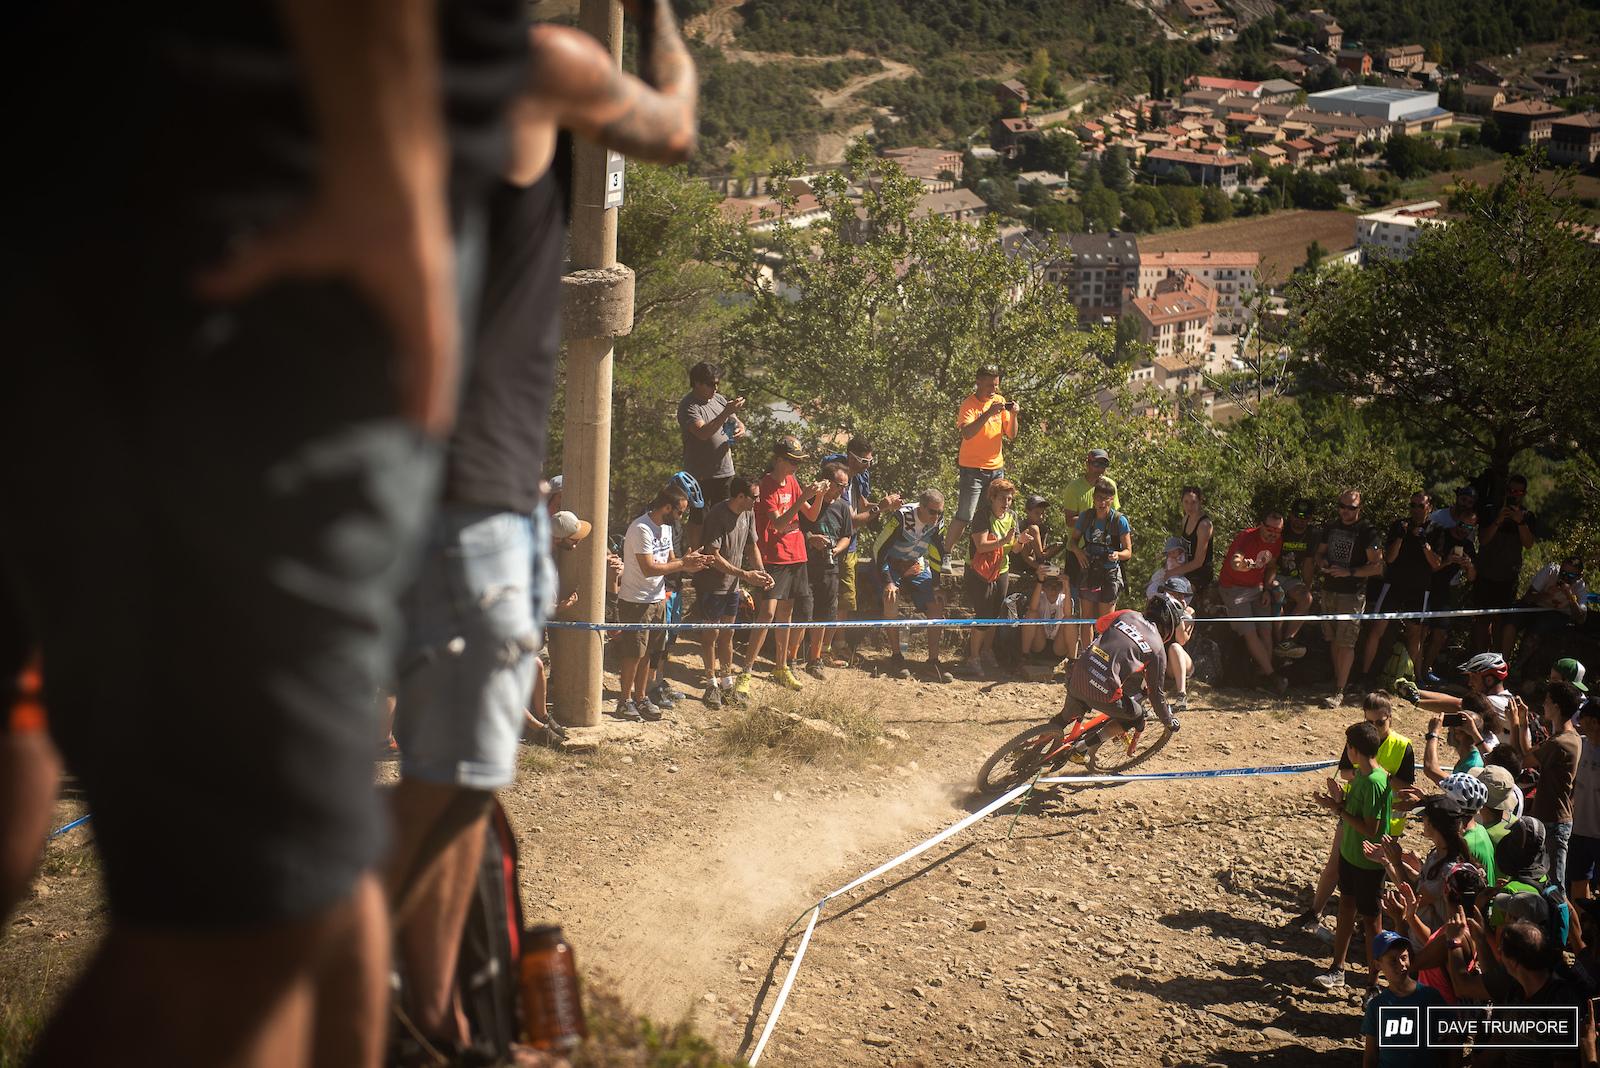 Florian Nicolai rails it down Stage 5.